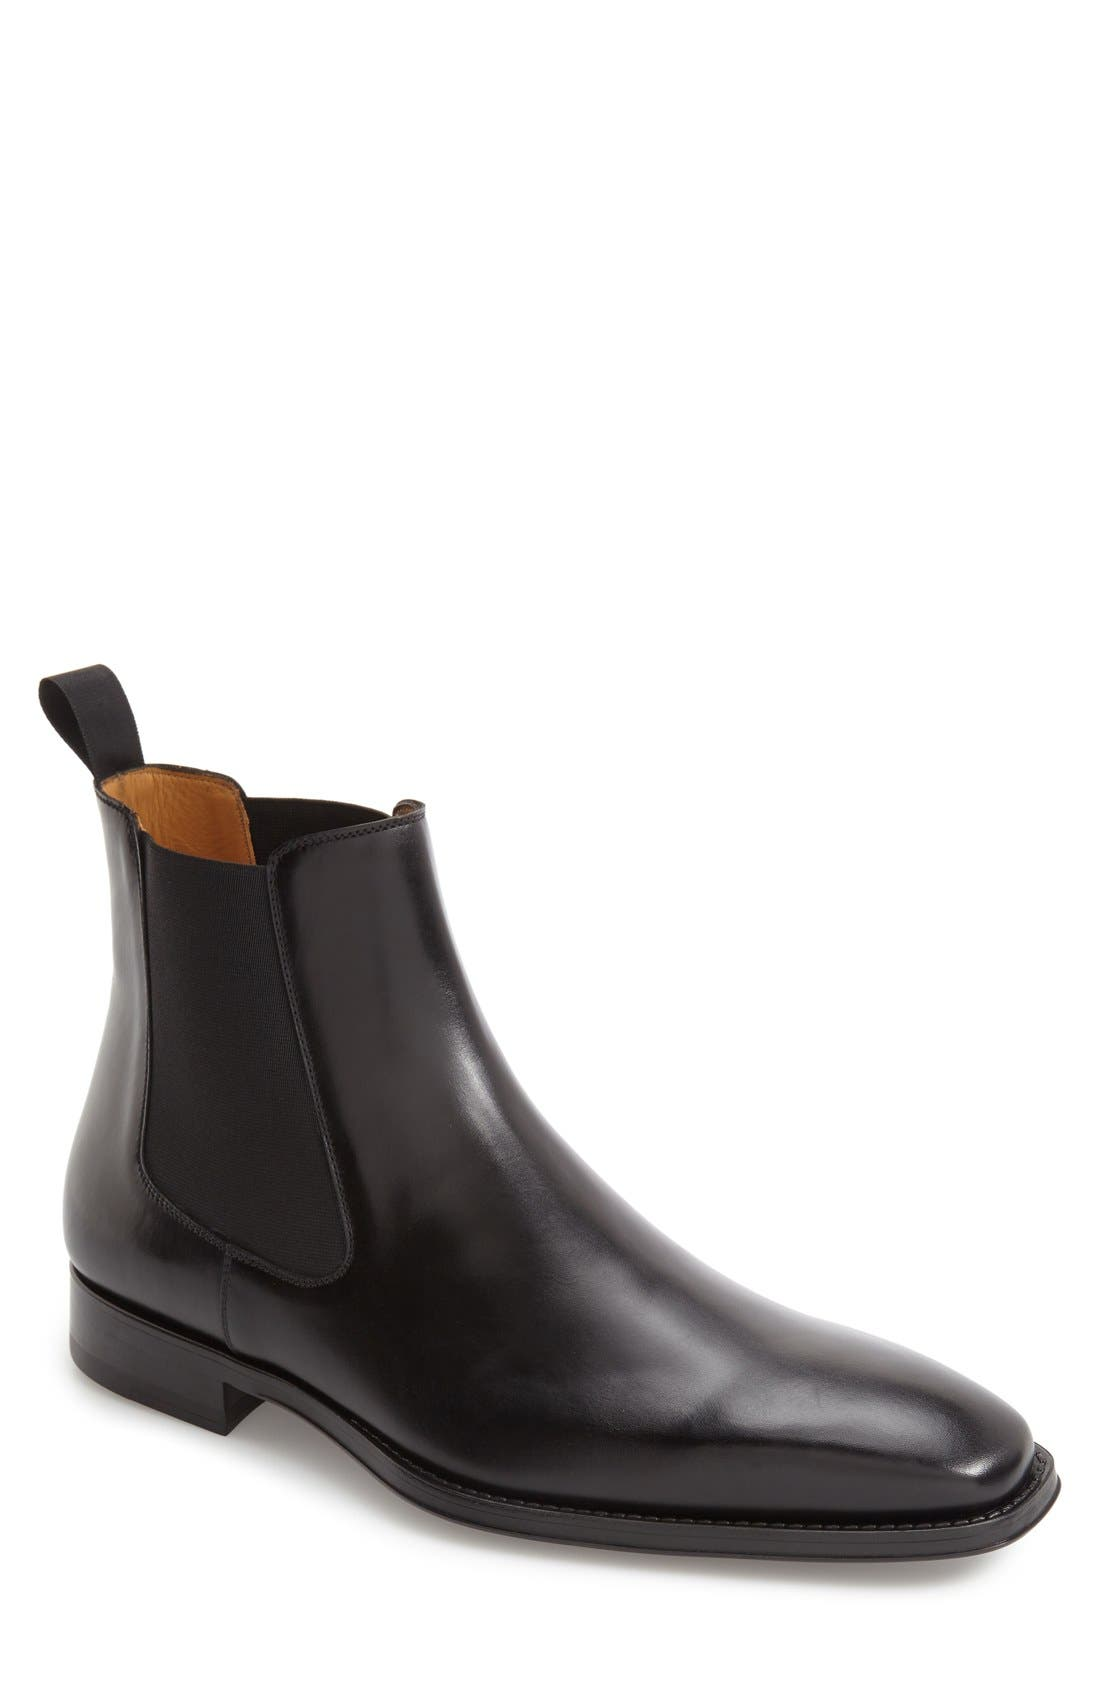 'Sean' Chelsea Boot,                             Main thumbnail 1, color,                             Black